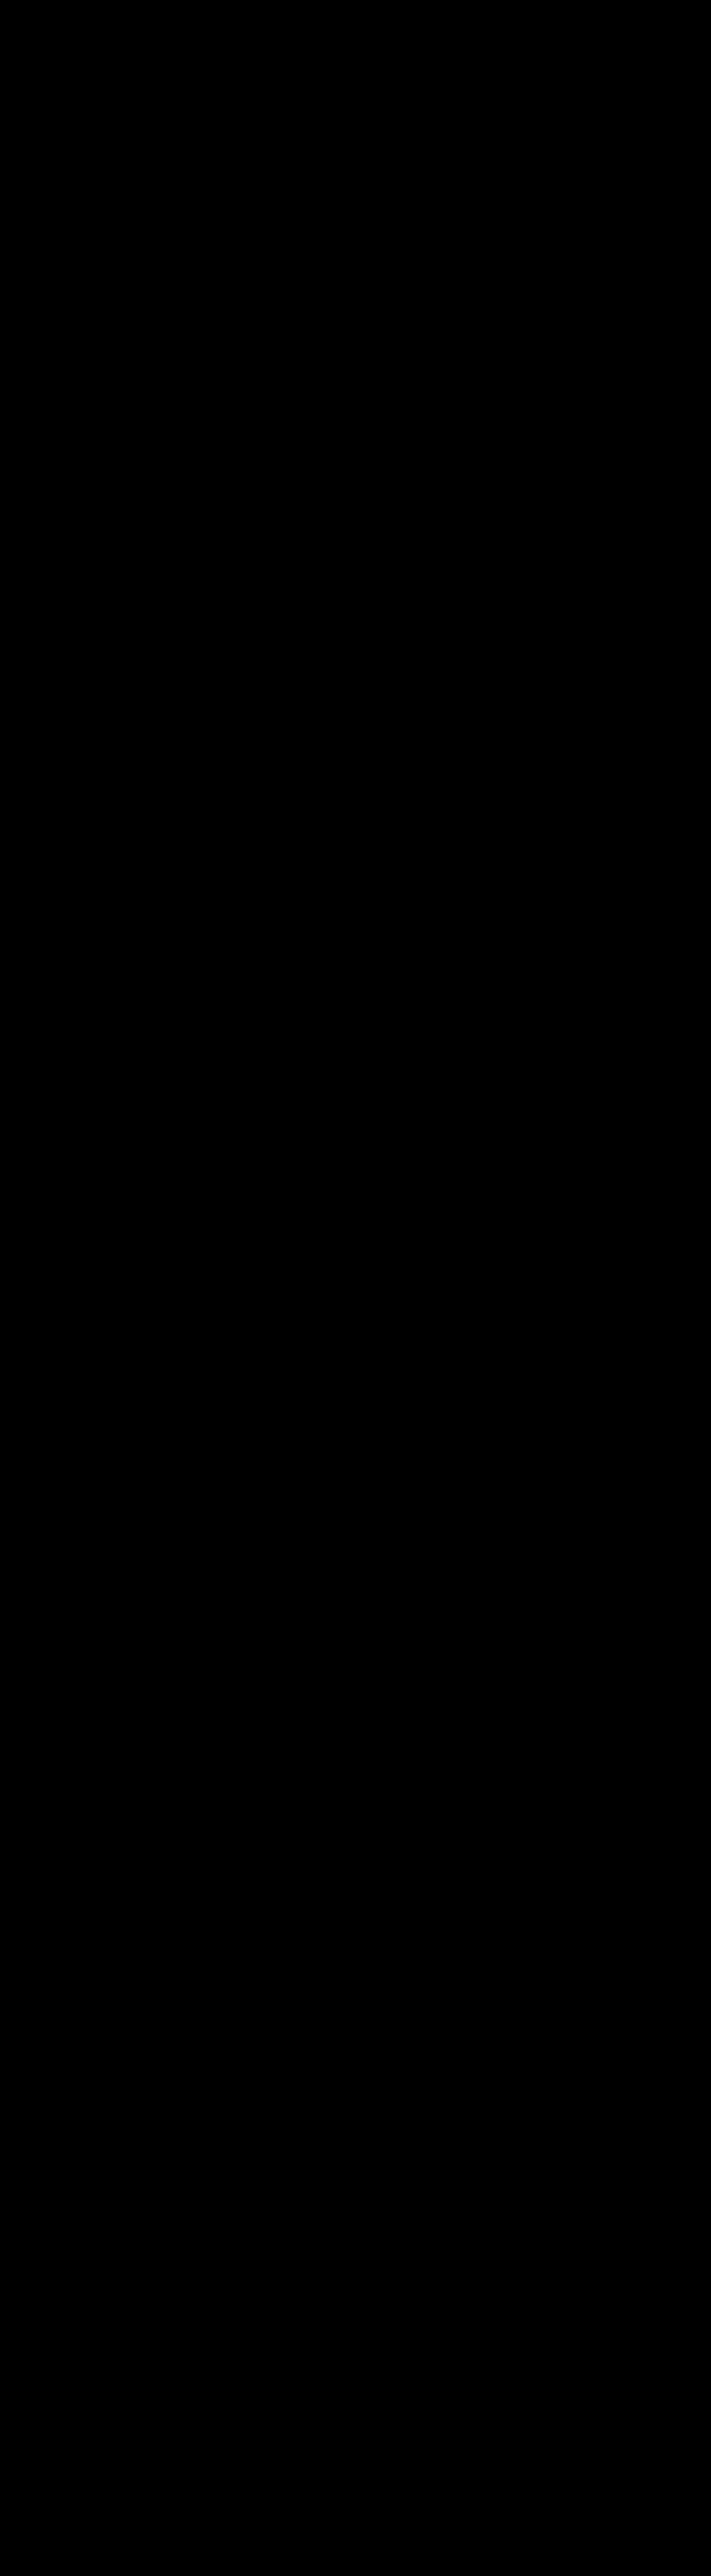 File svg wikimedia commons. Fraction clipart quarter fraction